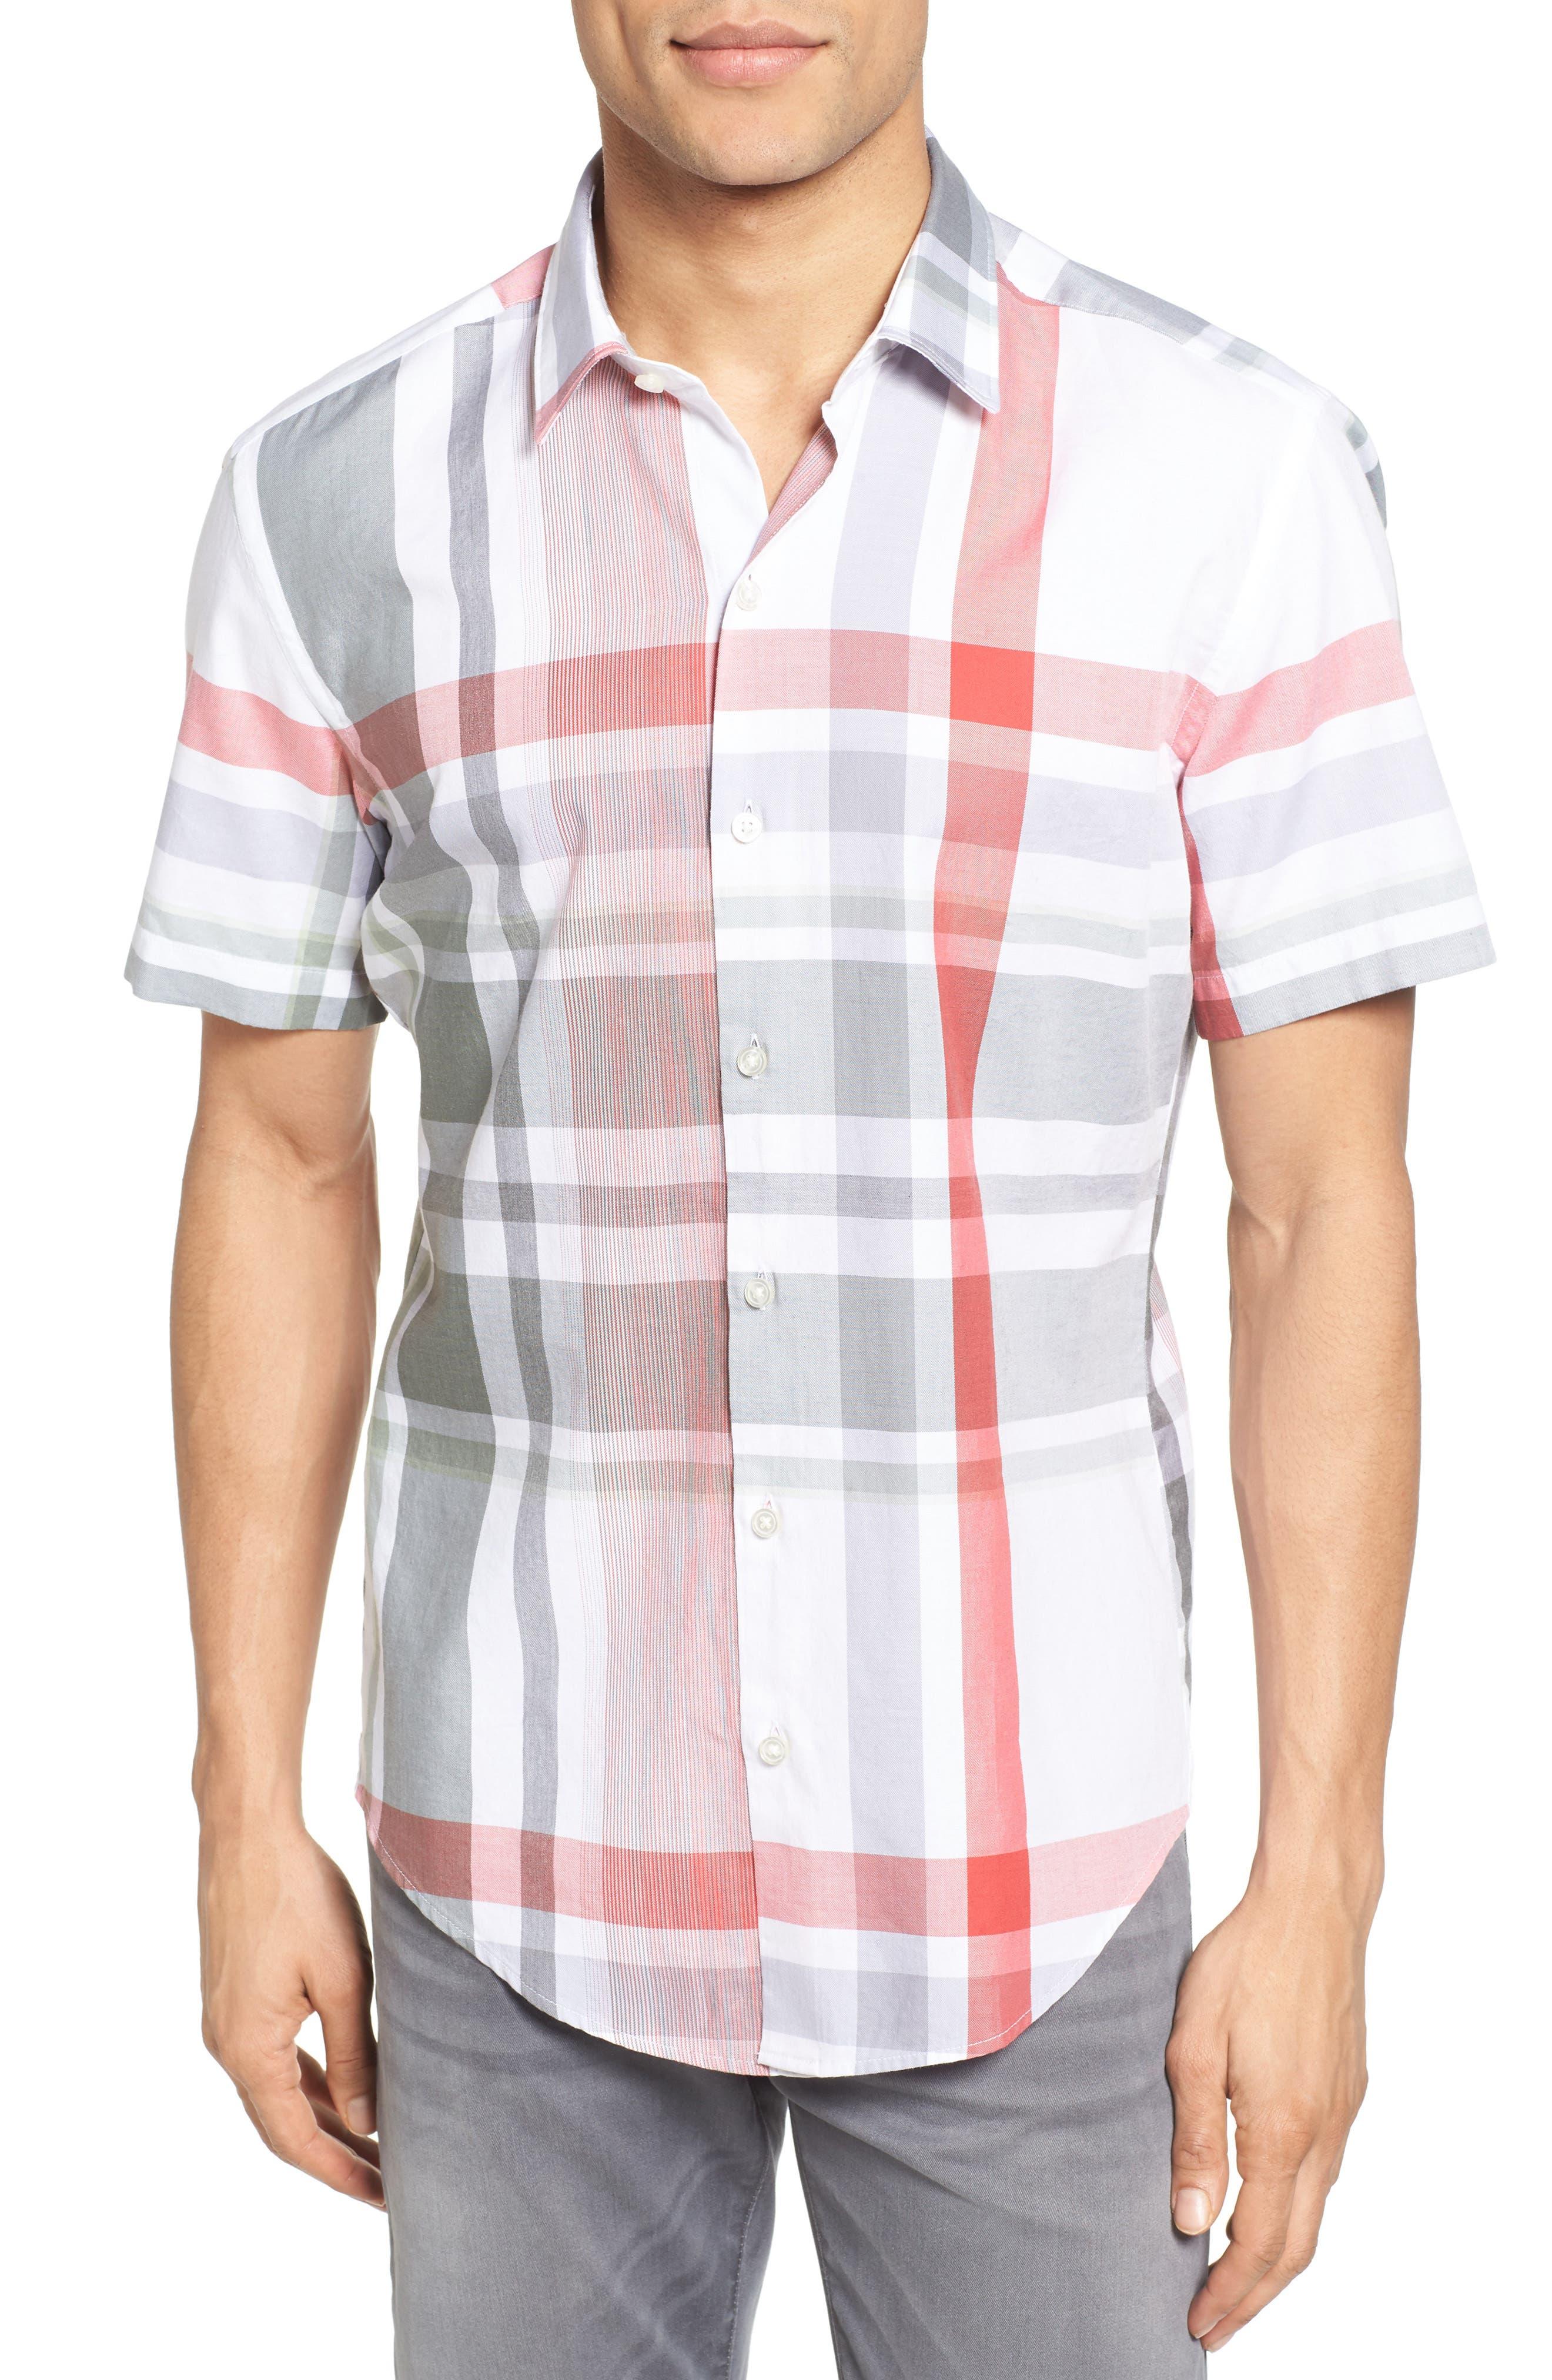 Robb Sharp Fit Plaid Sport Shirt,                             Main thumbnail 1, color,                             Red